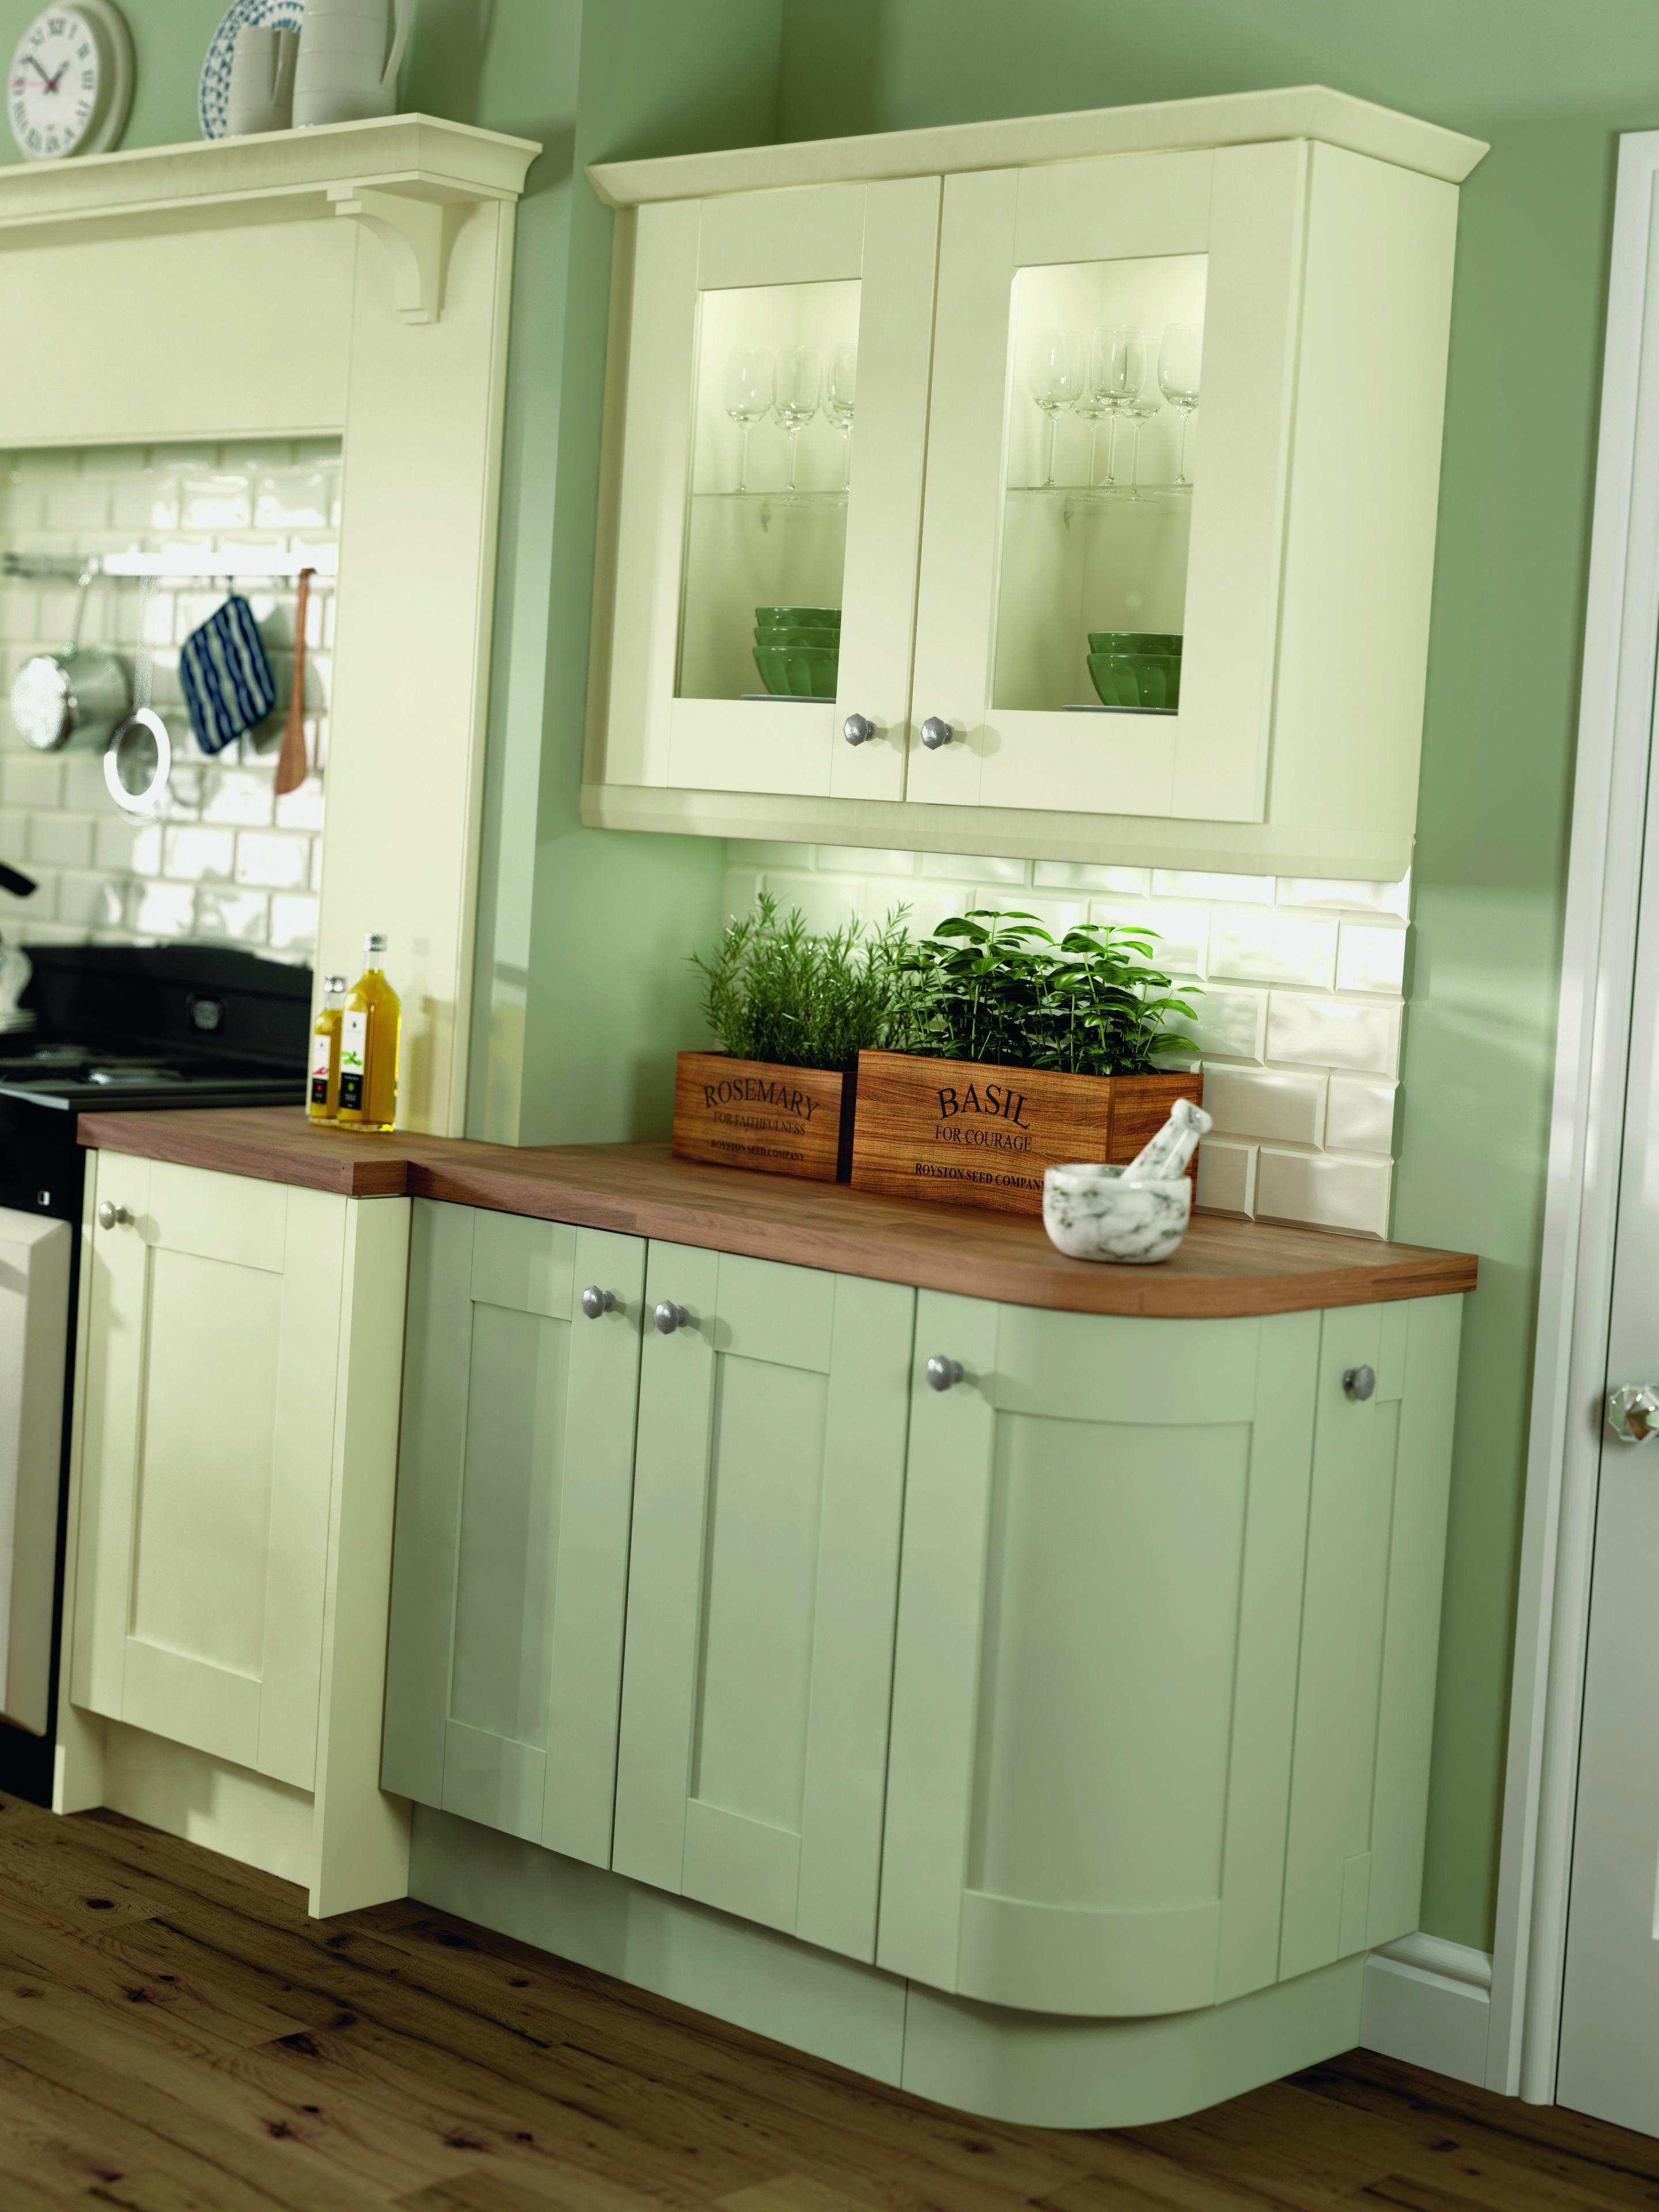 Rockfort Ivory and Cranbrook Sage Green kitchen walls